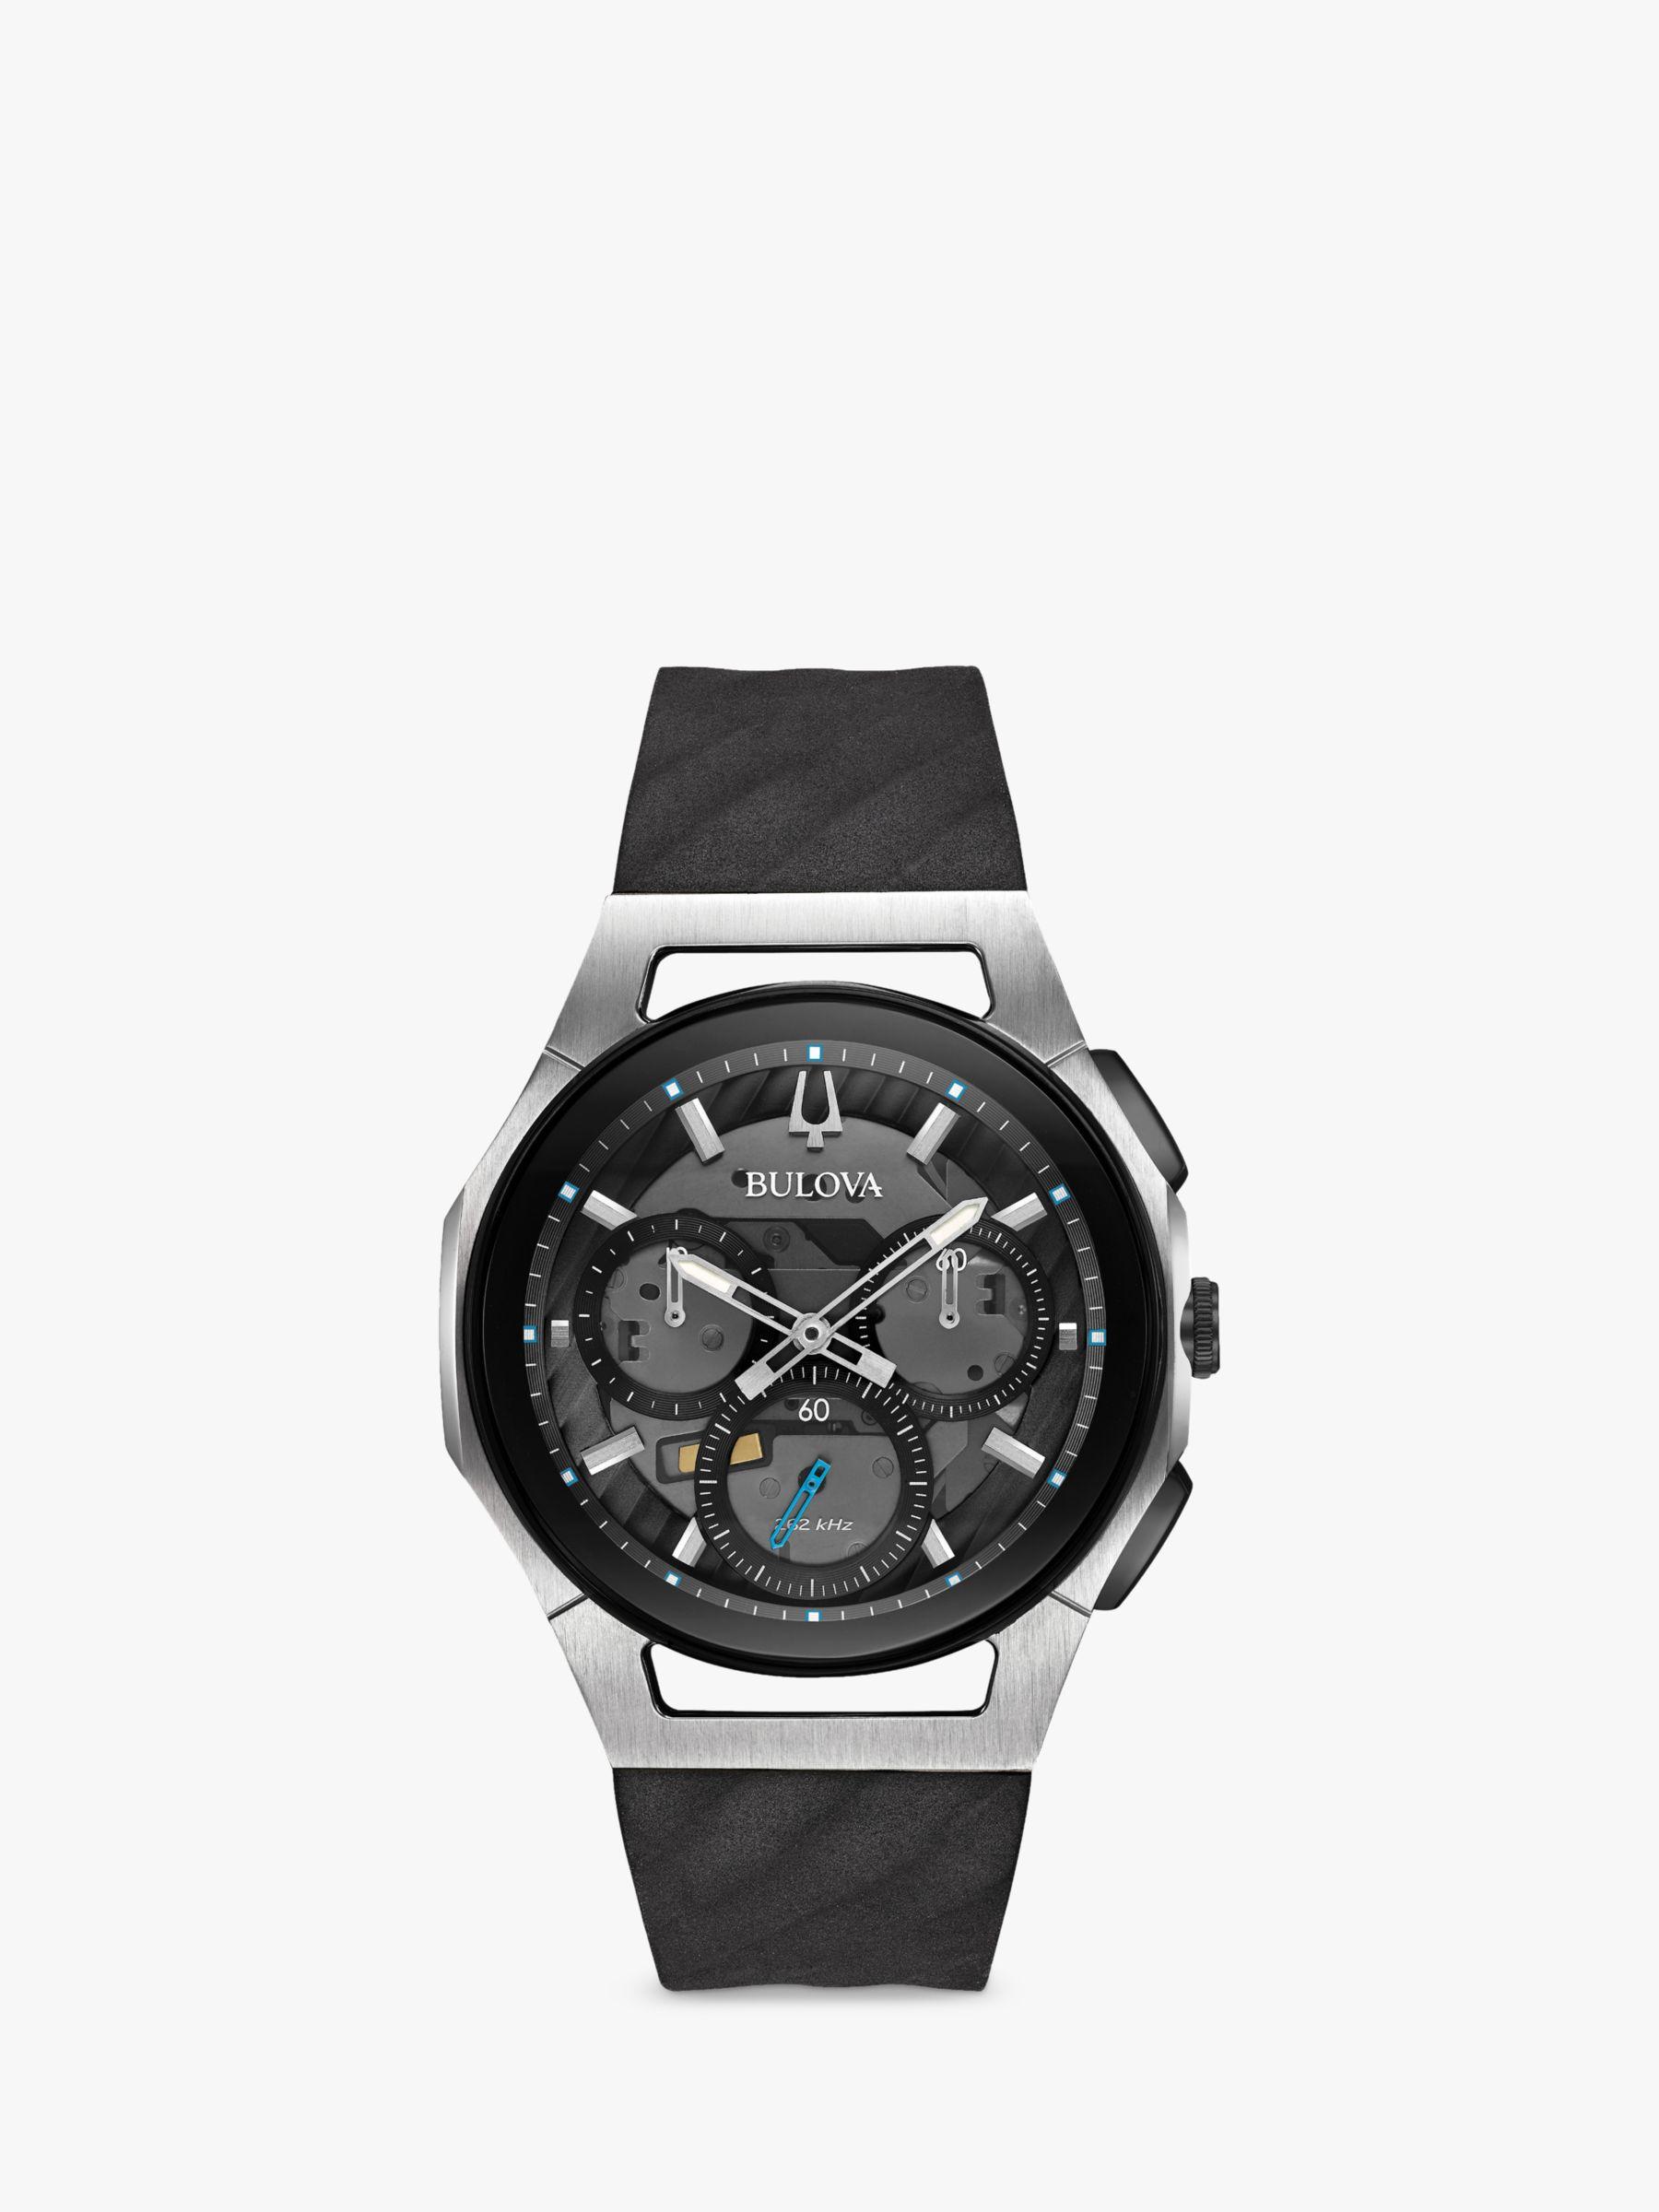 Bulova Bulova 98A161 Men's Curv Chronograph Silicone Strap Watch, Black